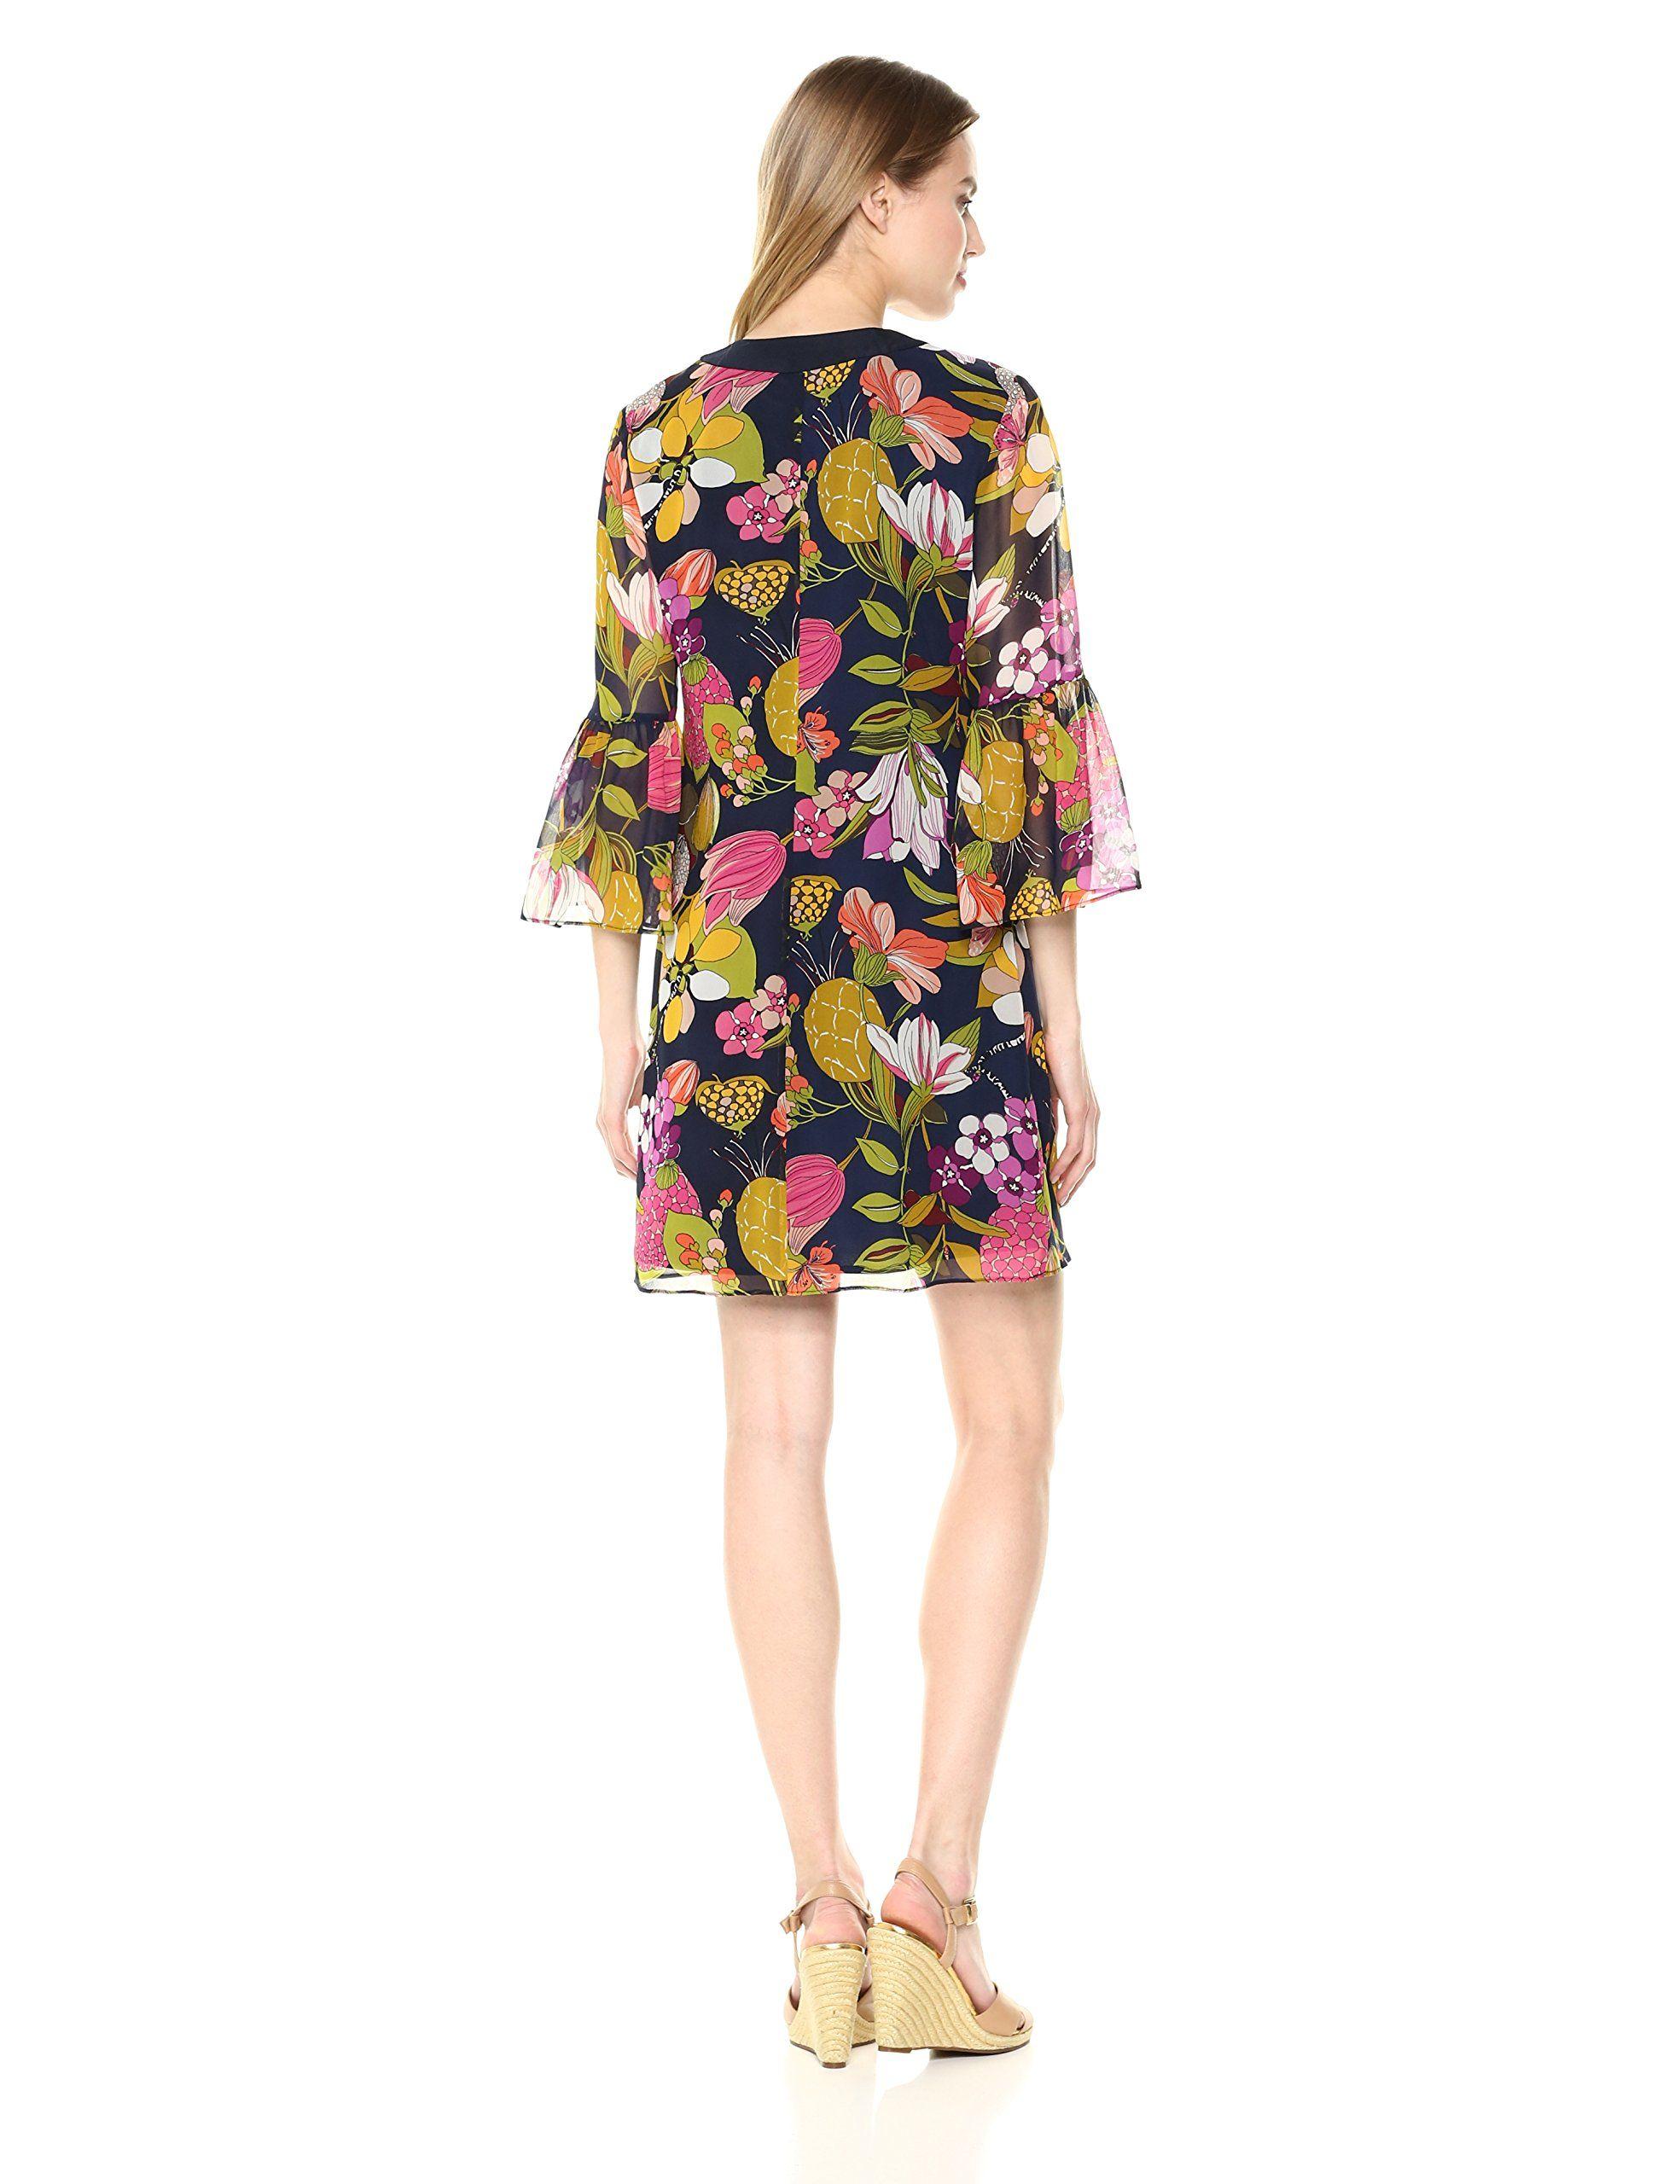 Trina Turk Sale Dresses